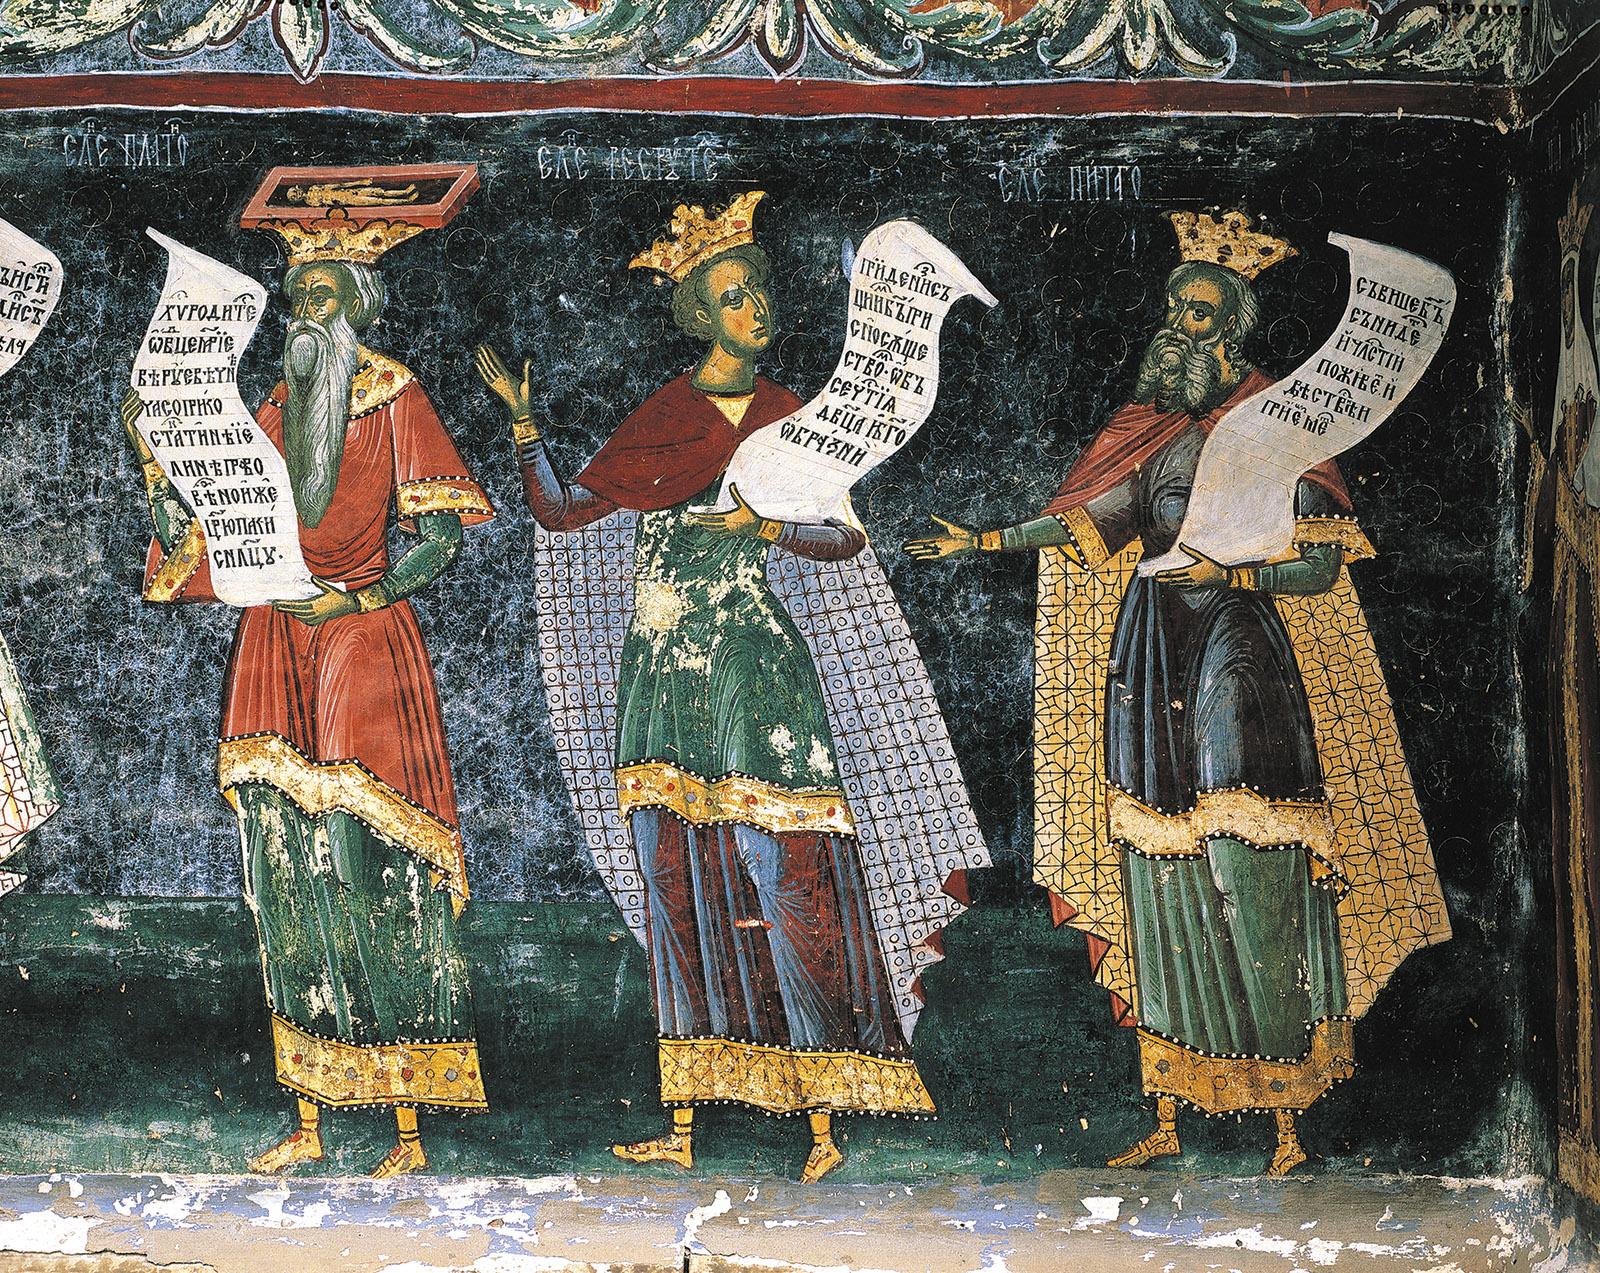 Plato, Pythagoras, and Solon; fresco in St. George's Church, Suceava, Romania, sixteenth century